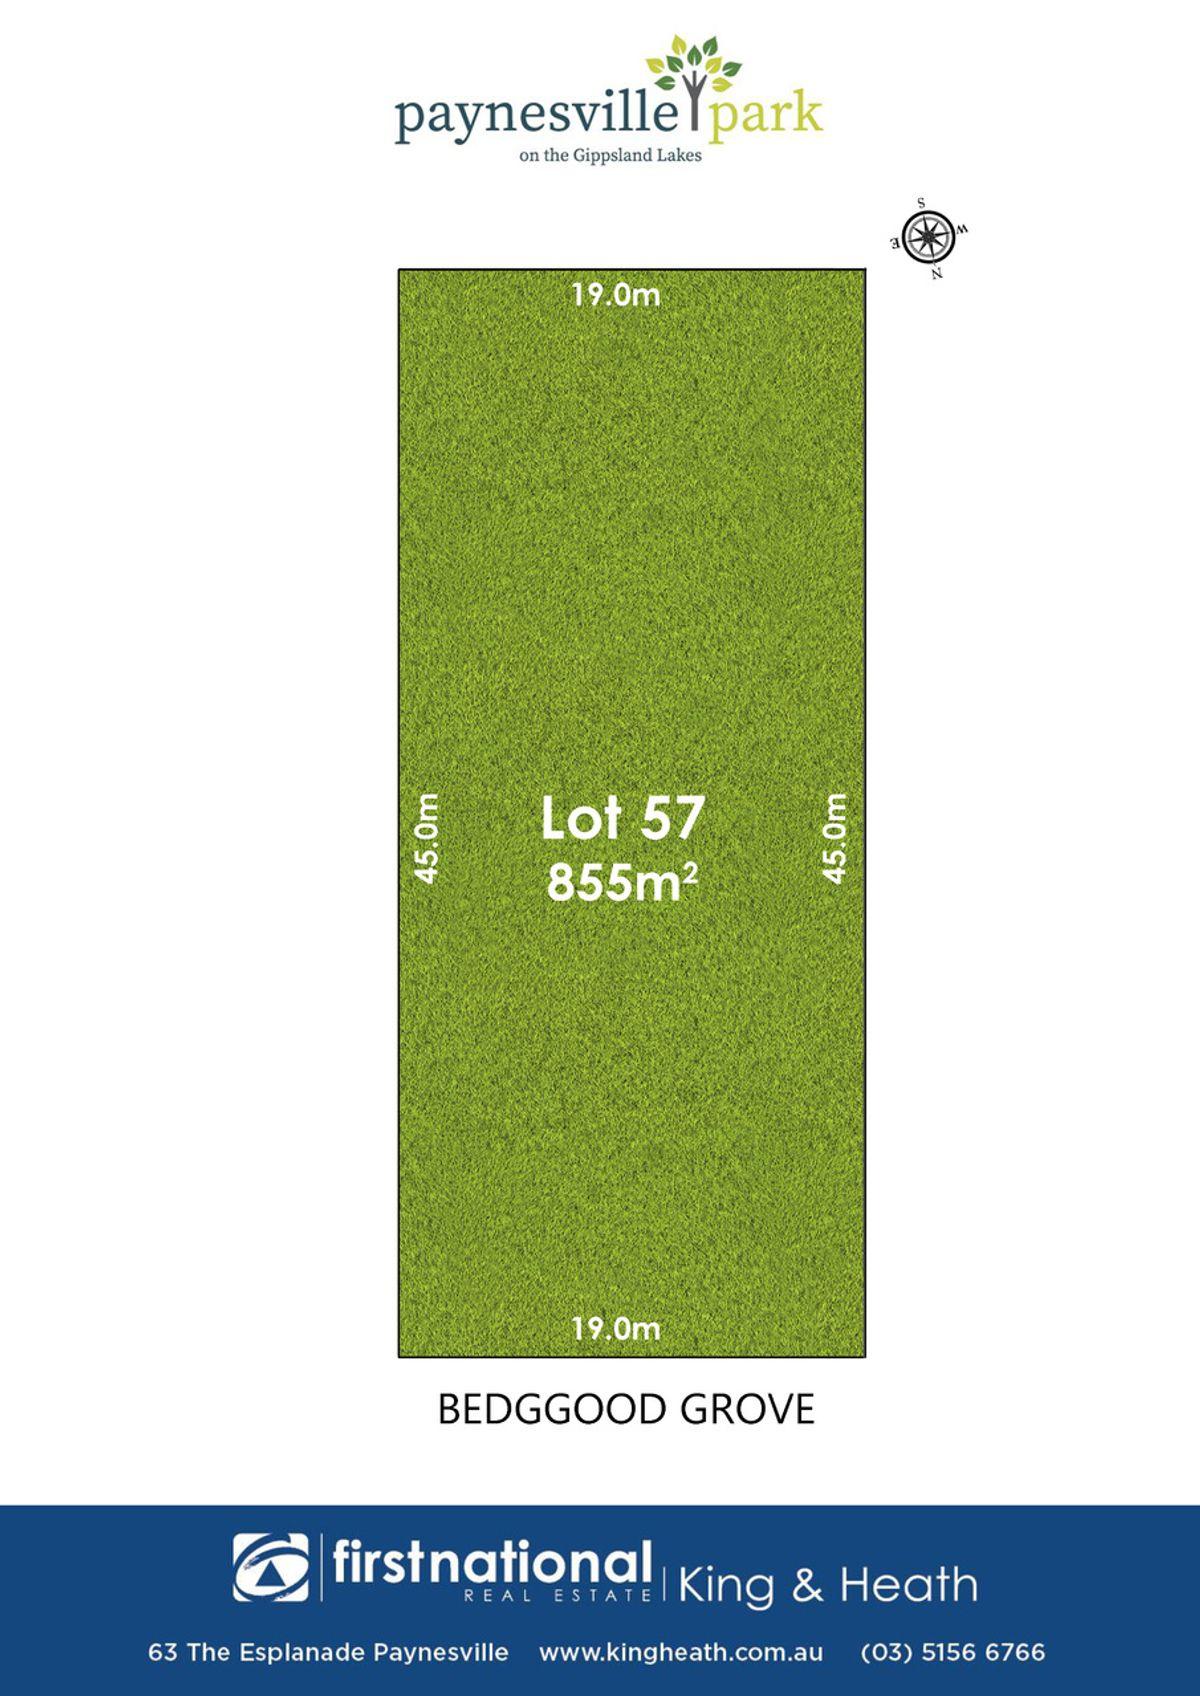 Lot 57 Bedggood Grove, Paynesville, VIC 3880